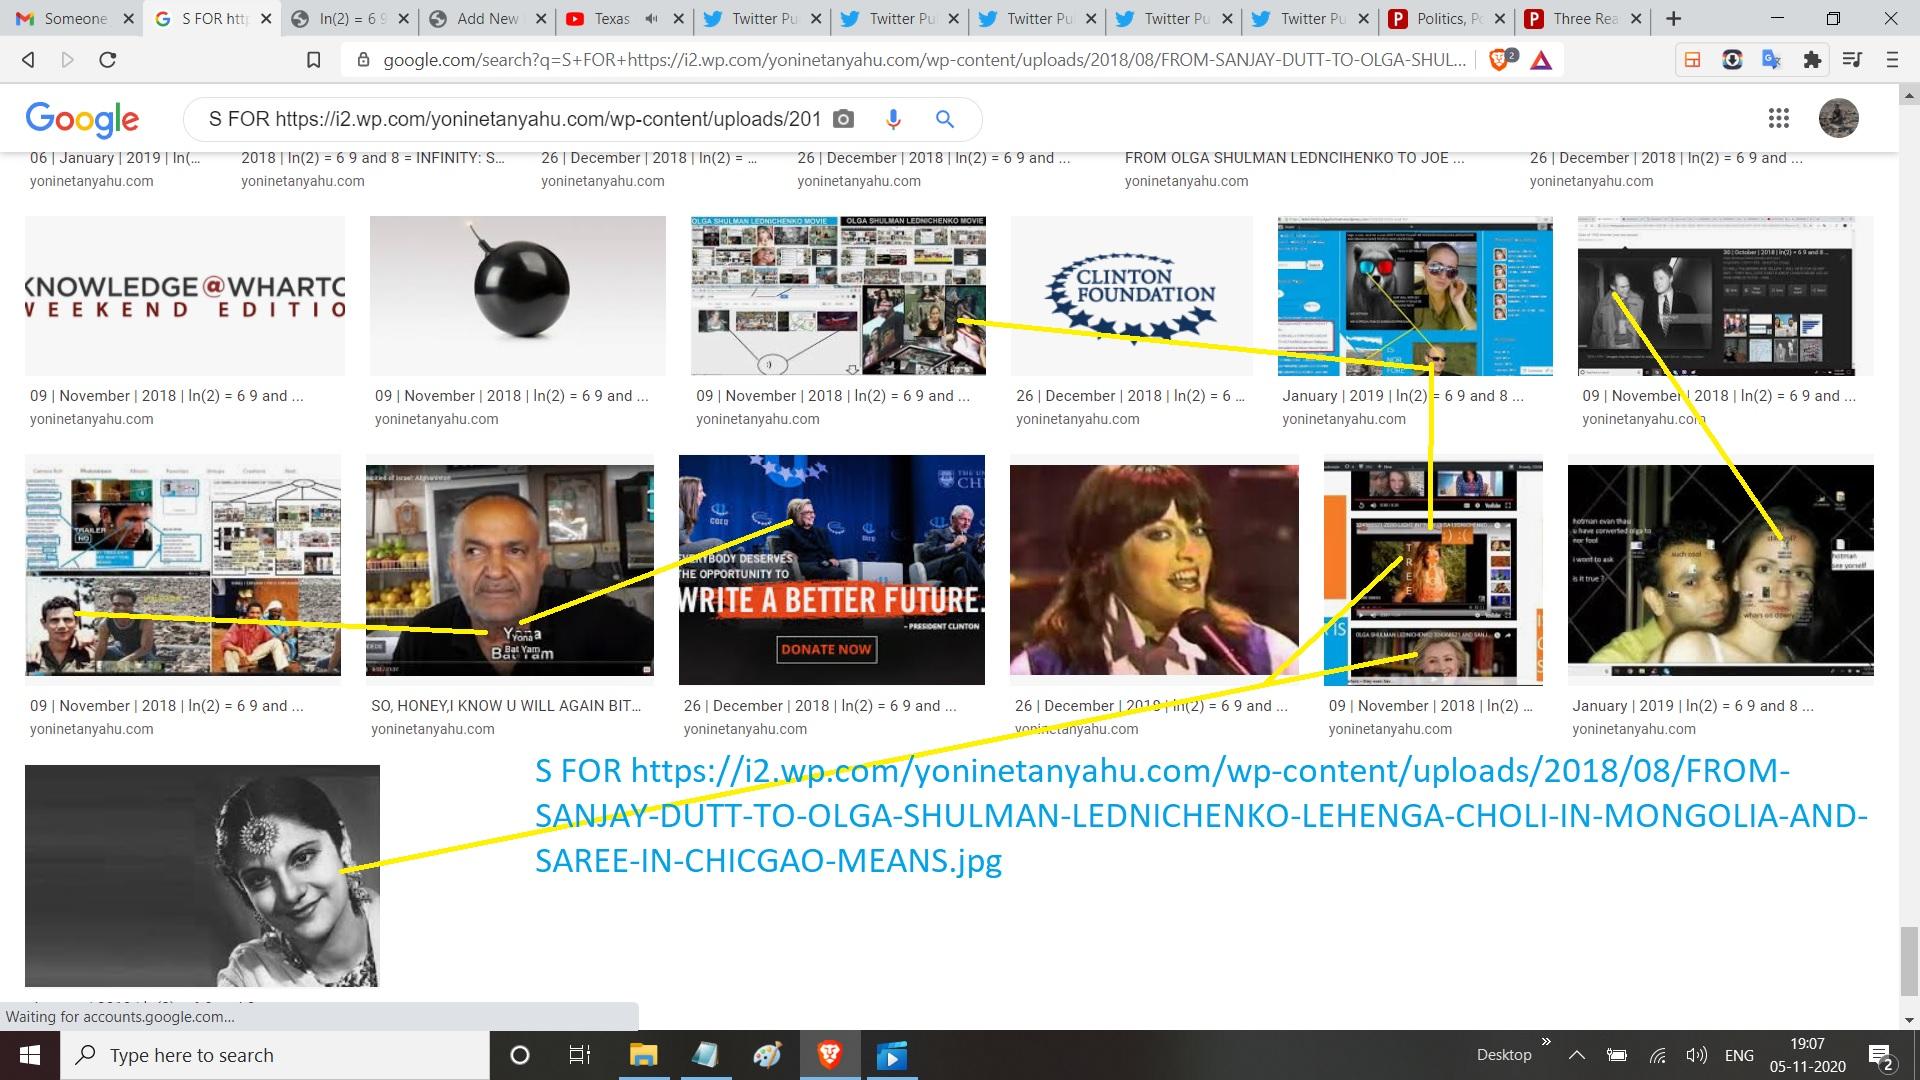 S FOR https://i2.wp.com/yoninetanyahu.com/wp-content/uploads/2018/08/FROM-SANJAY-DUTT-TO-OLGA-SHULMAN-LEDNICHENKO-LEHENGA-CHOLI-IN-MONGOLIA-AND-SAREE-IN-CHICGAO-MEANS.jpg